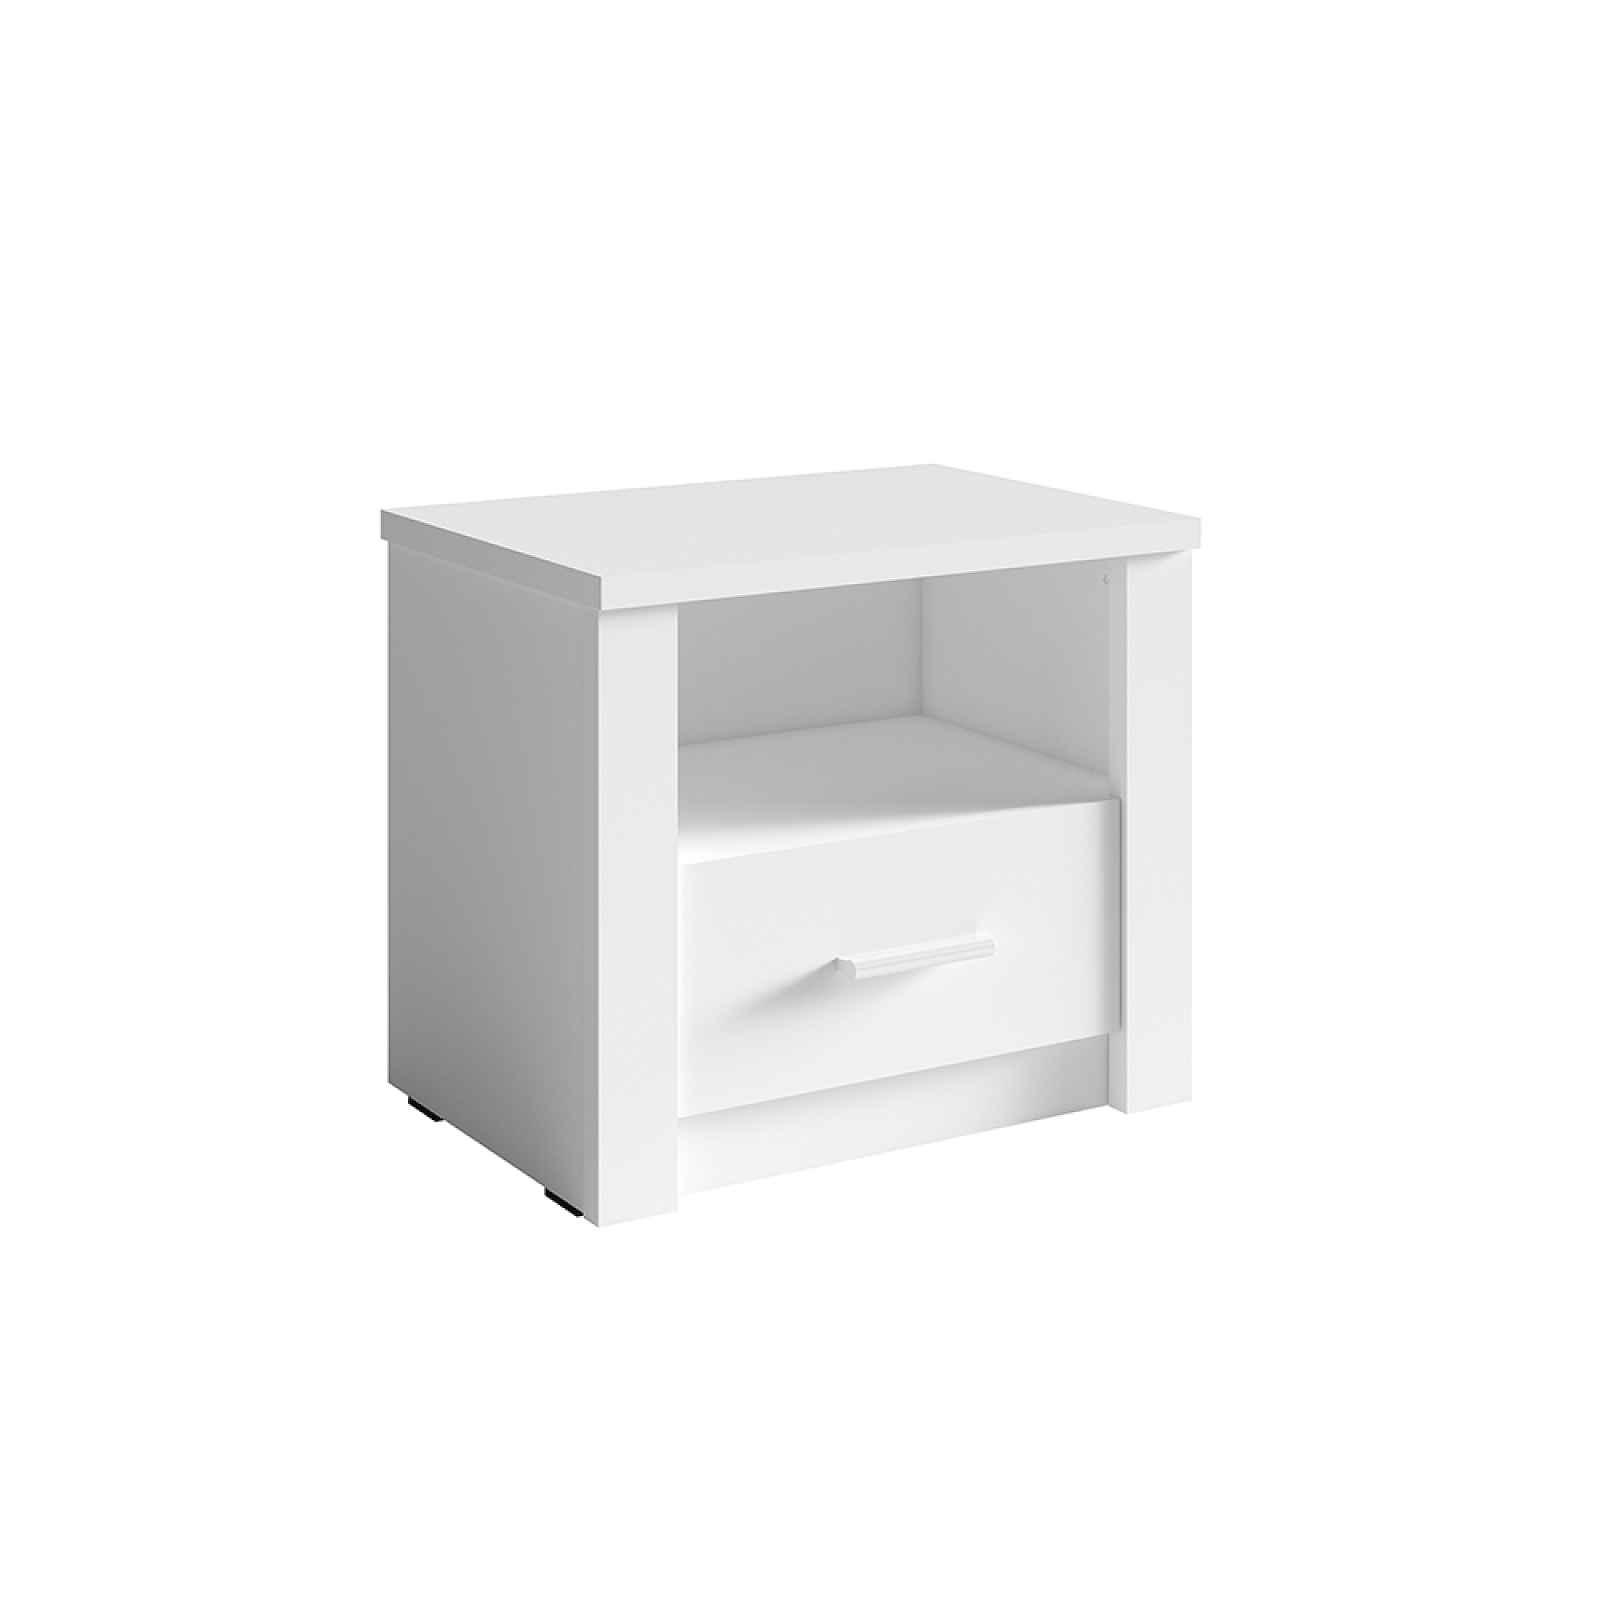 Noční stolek RAMIAK 2 ks bílá Tempo Kondela